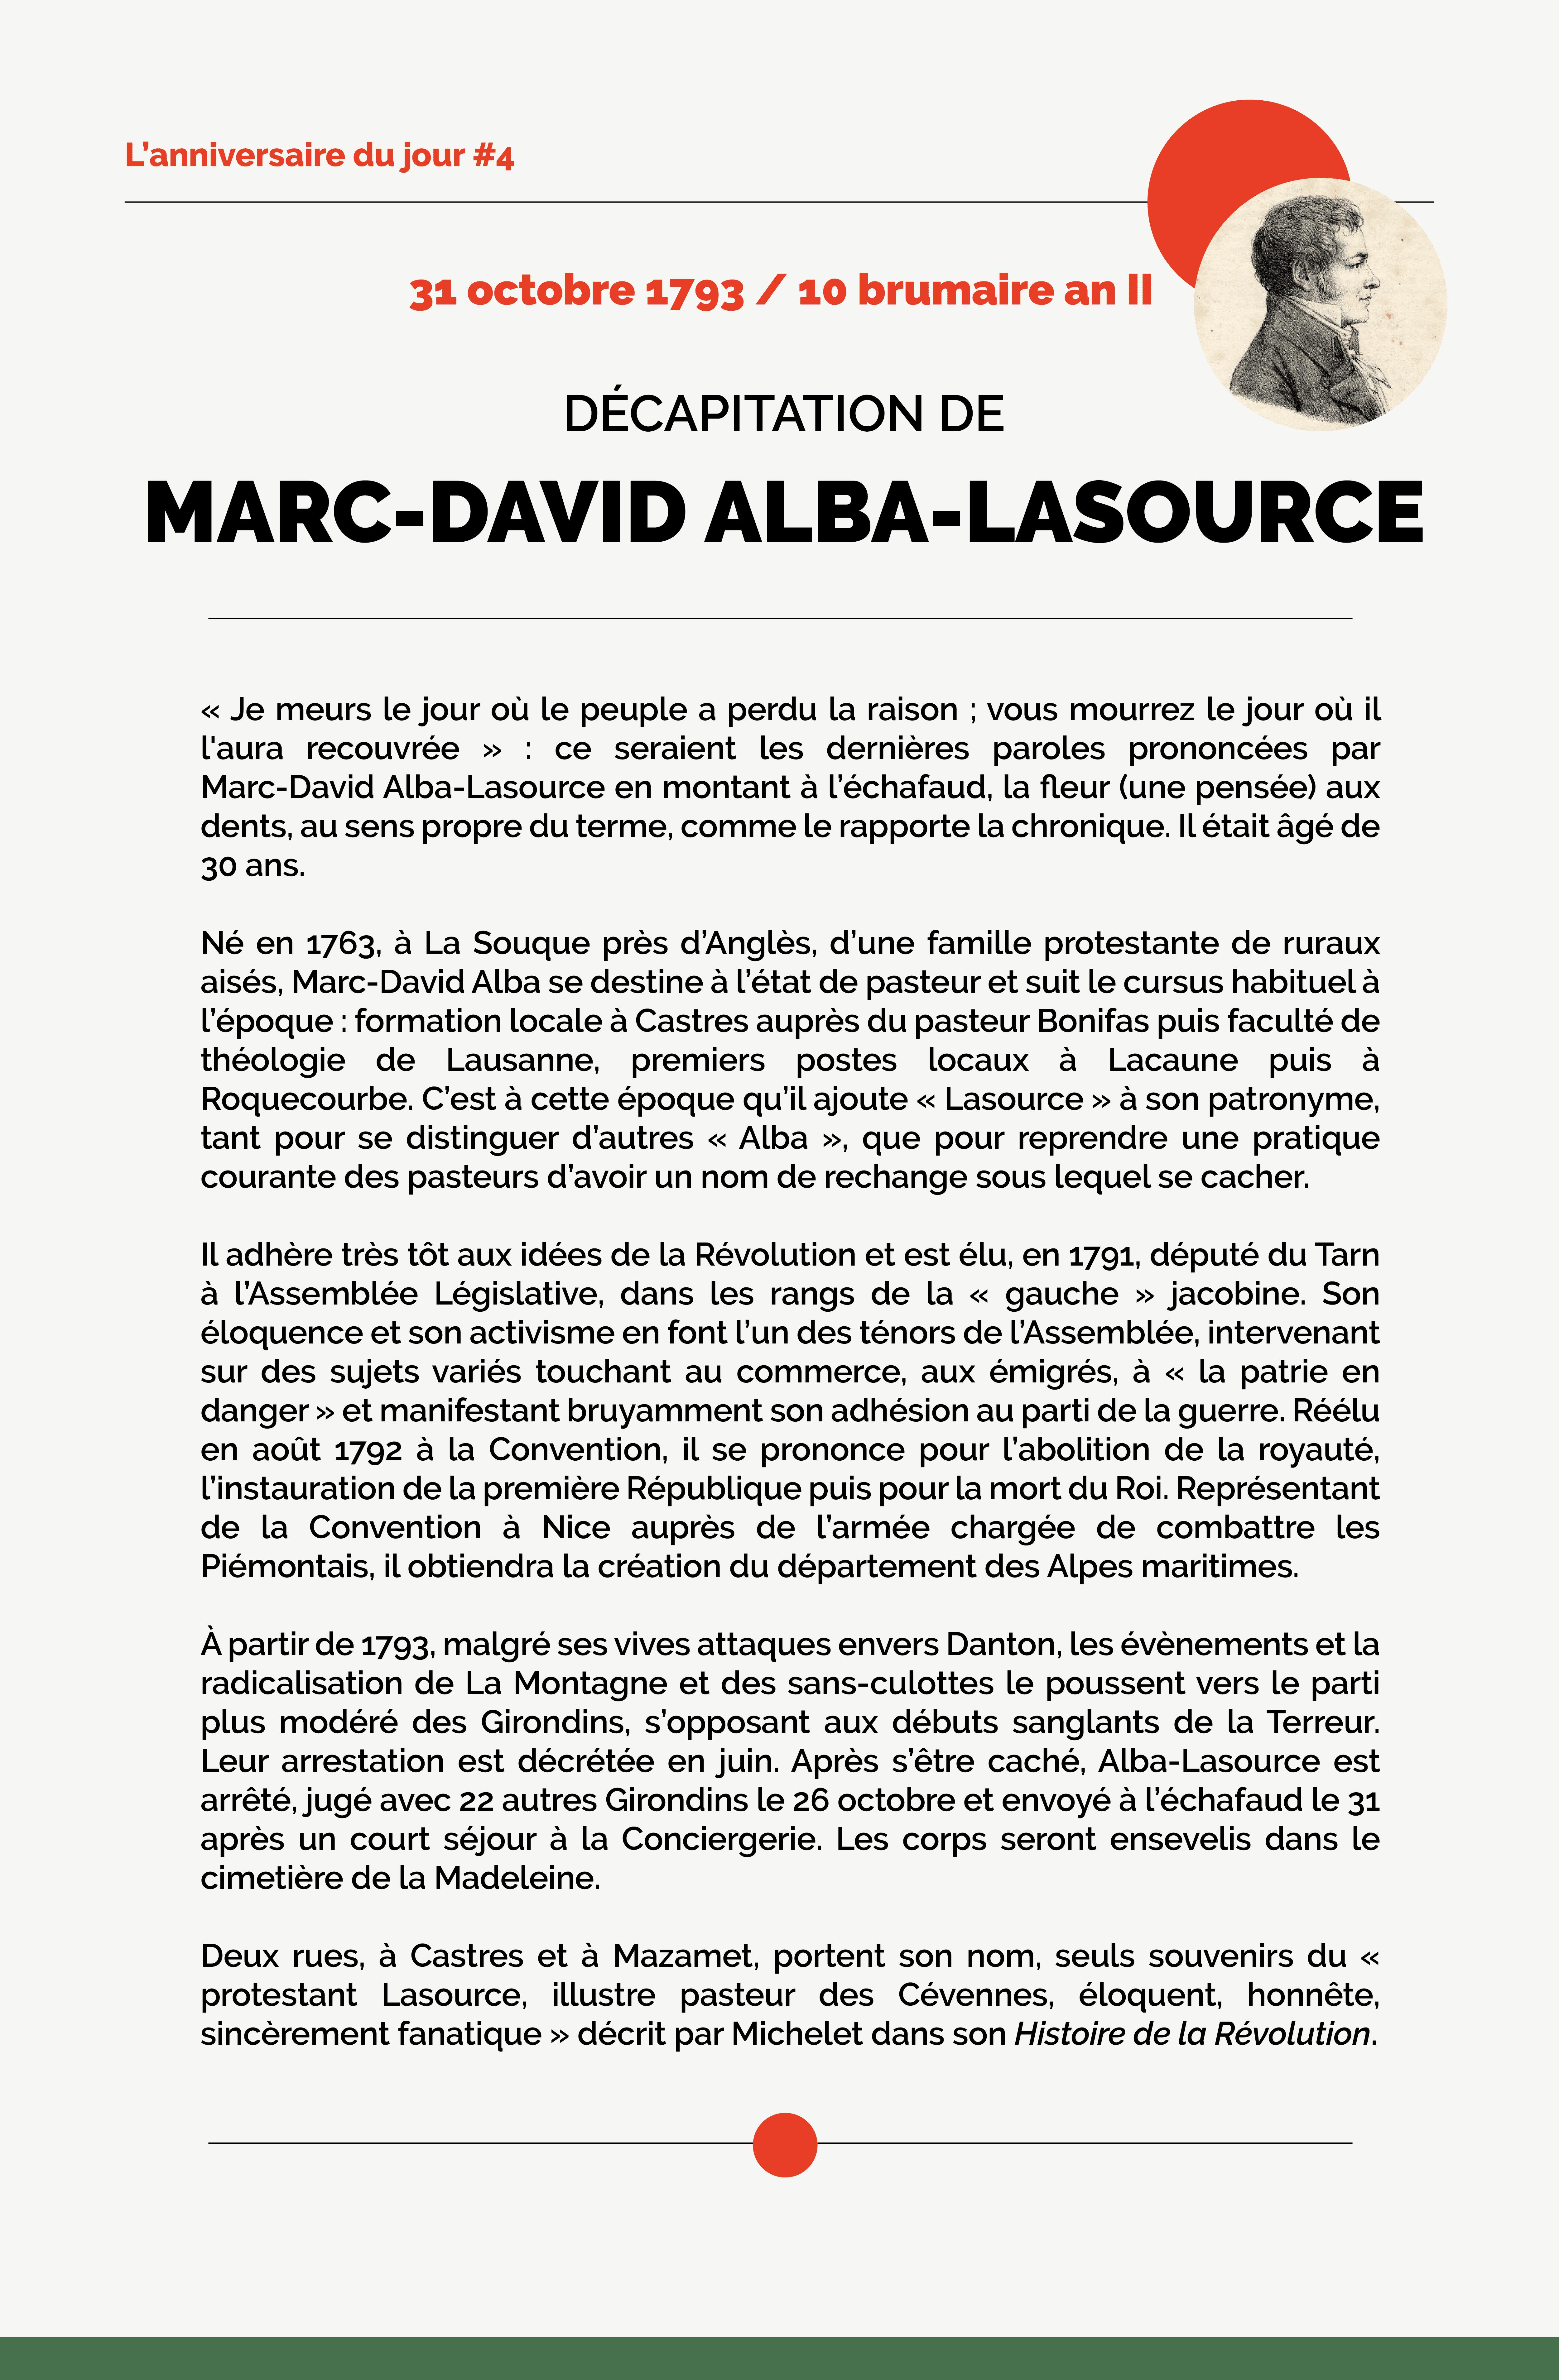 Anniversaire-Tarnais-Marc-David Alba-Lasource